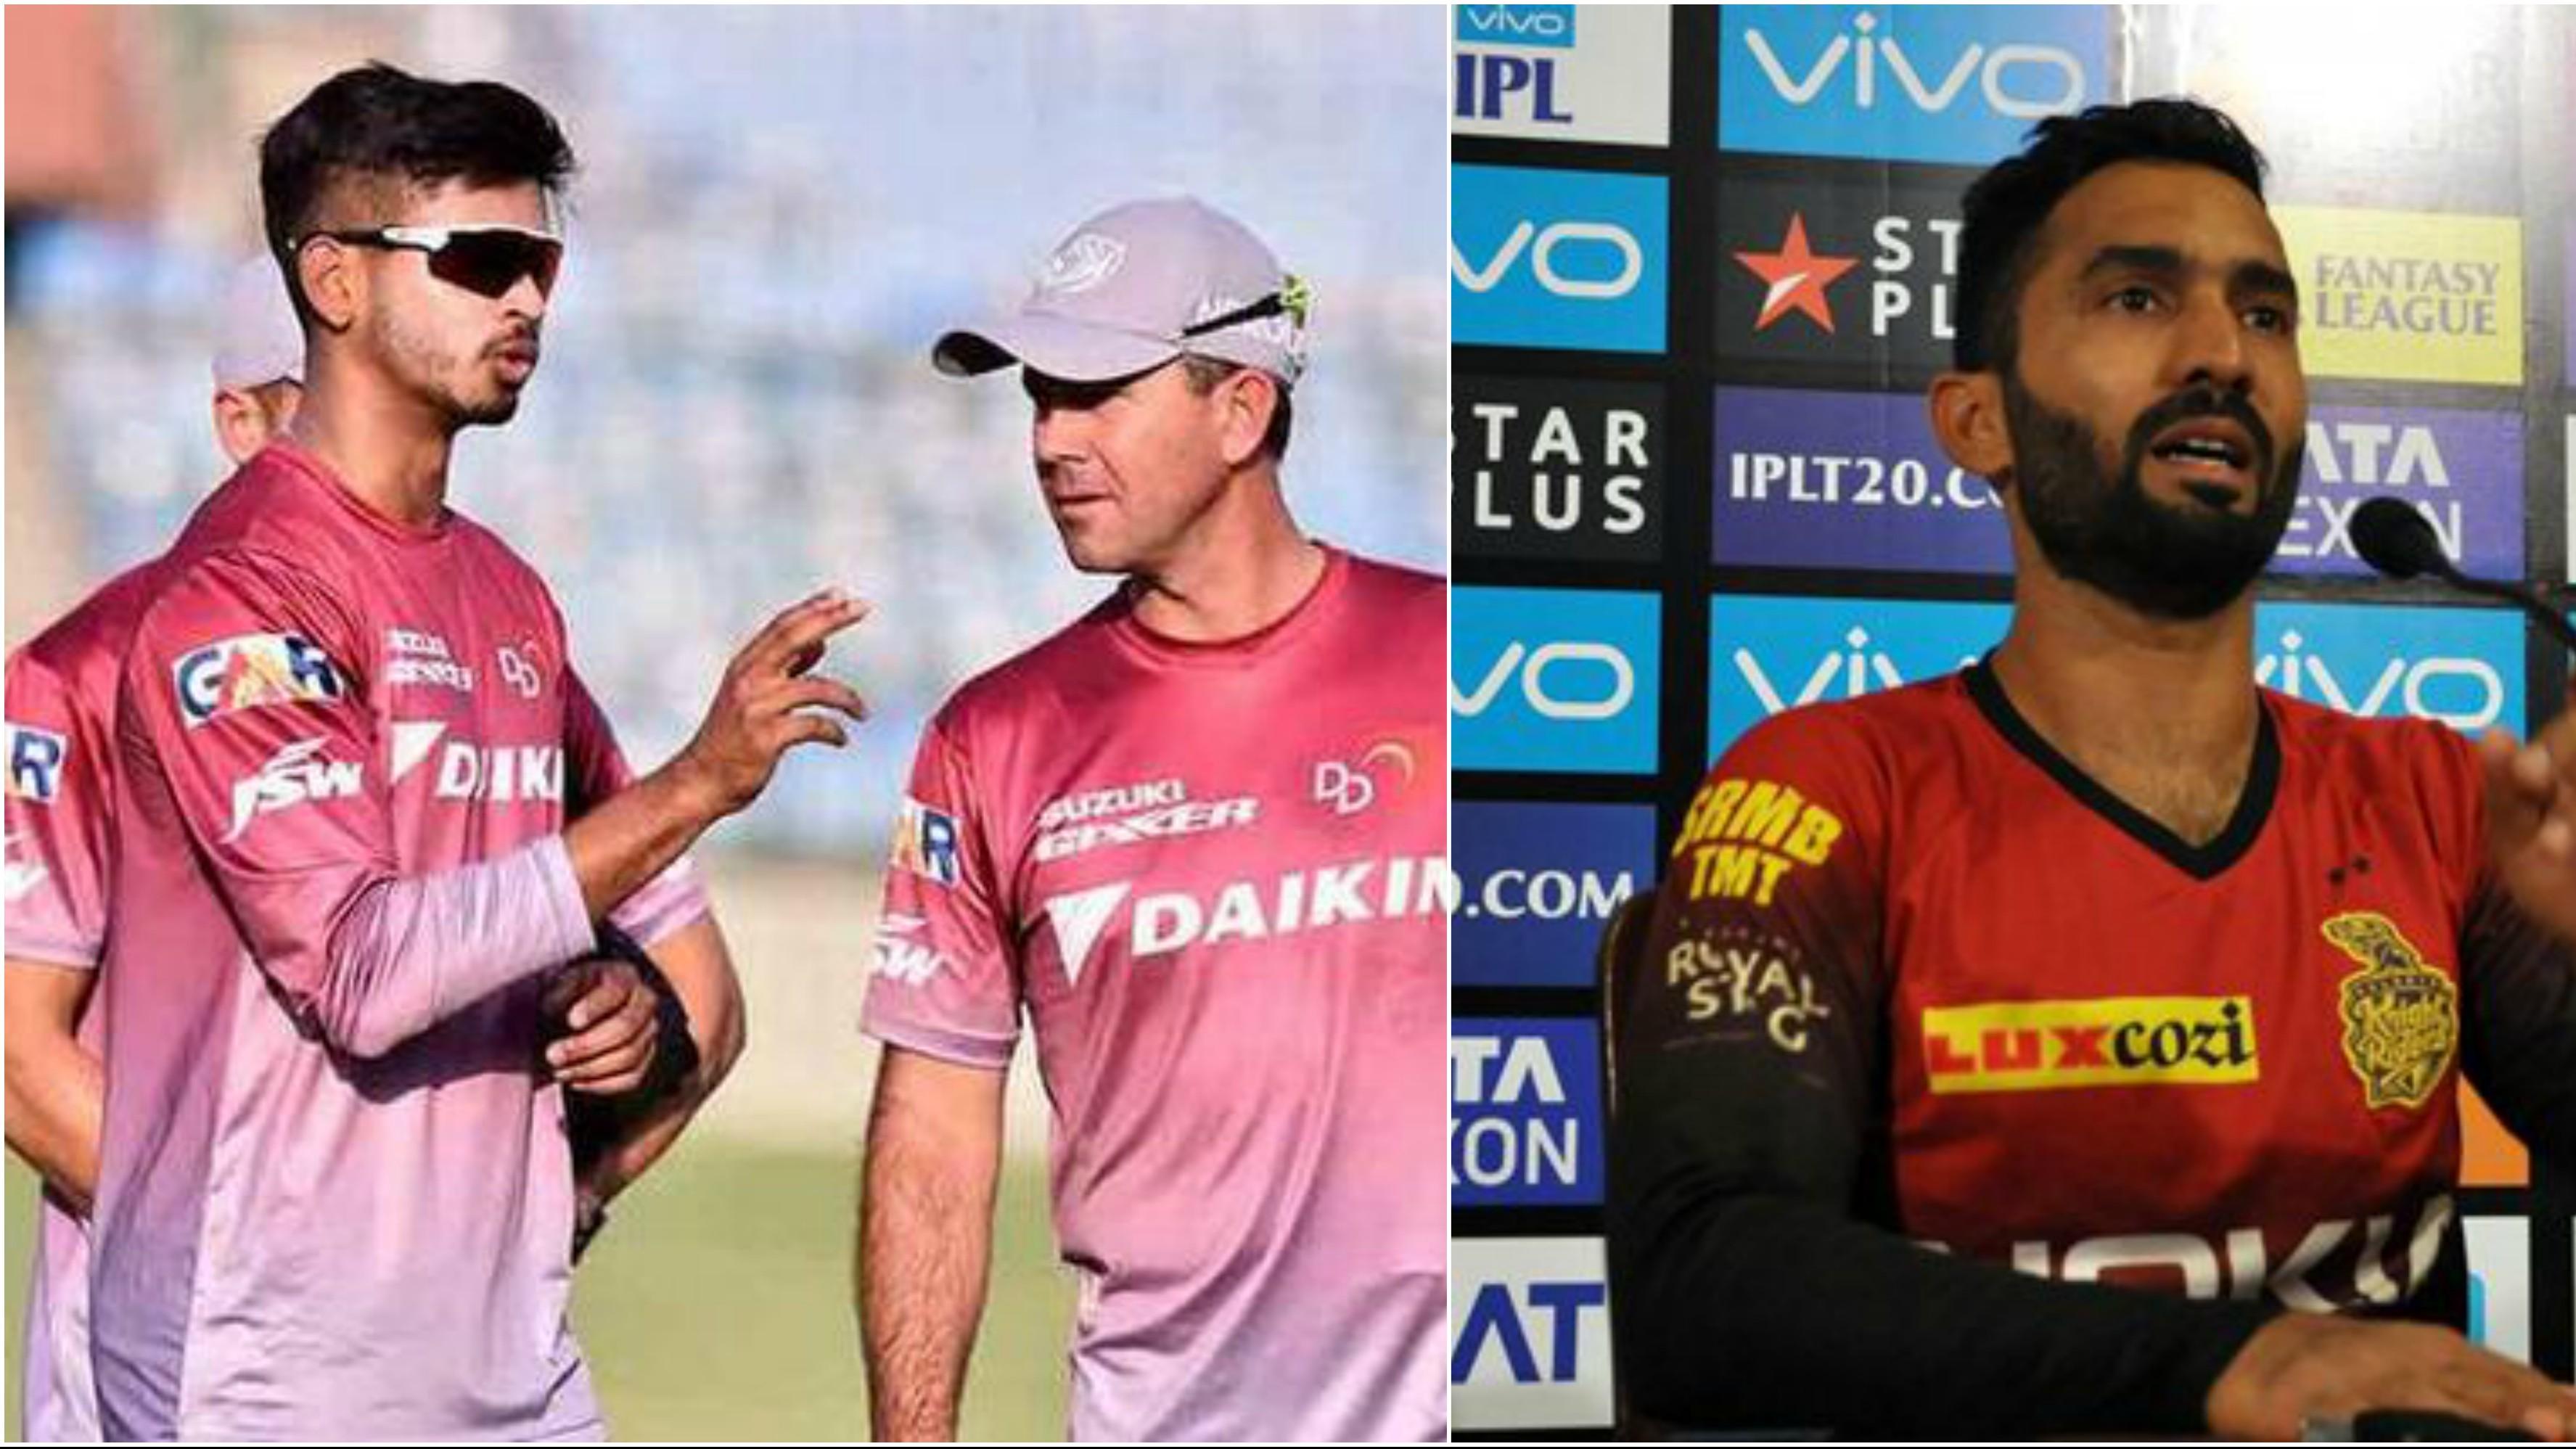 IPL 2018: Match 26, DD vs KKR: Iyer faces Kolkata challenge on captaincy debut for Daredevils